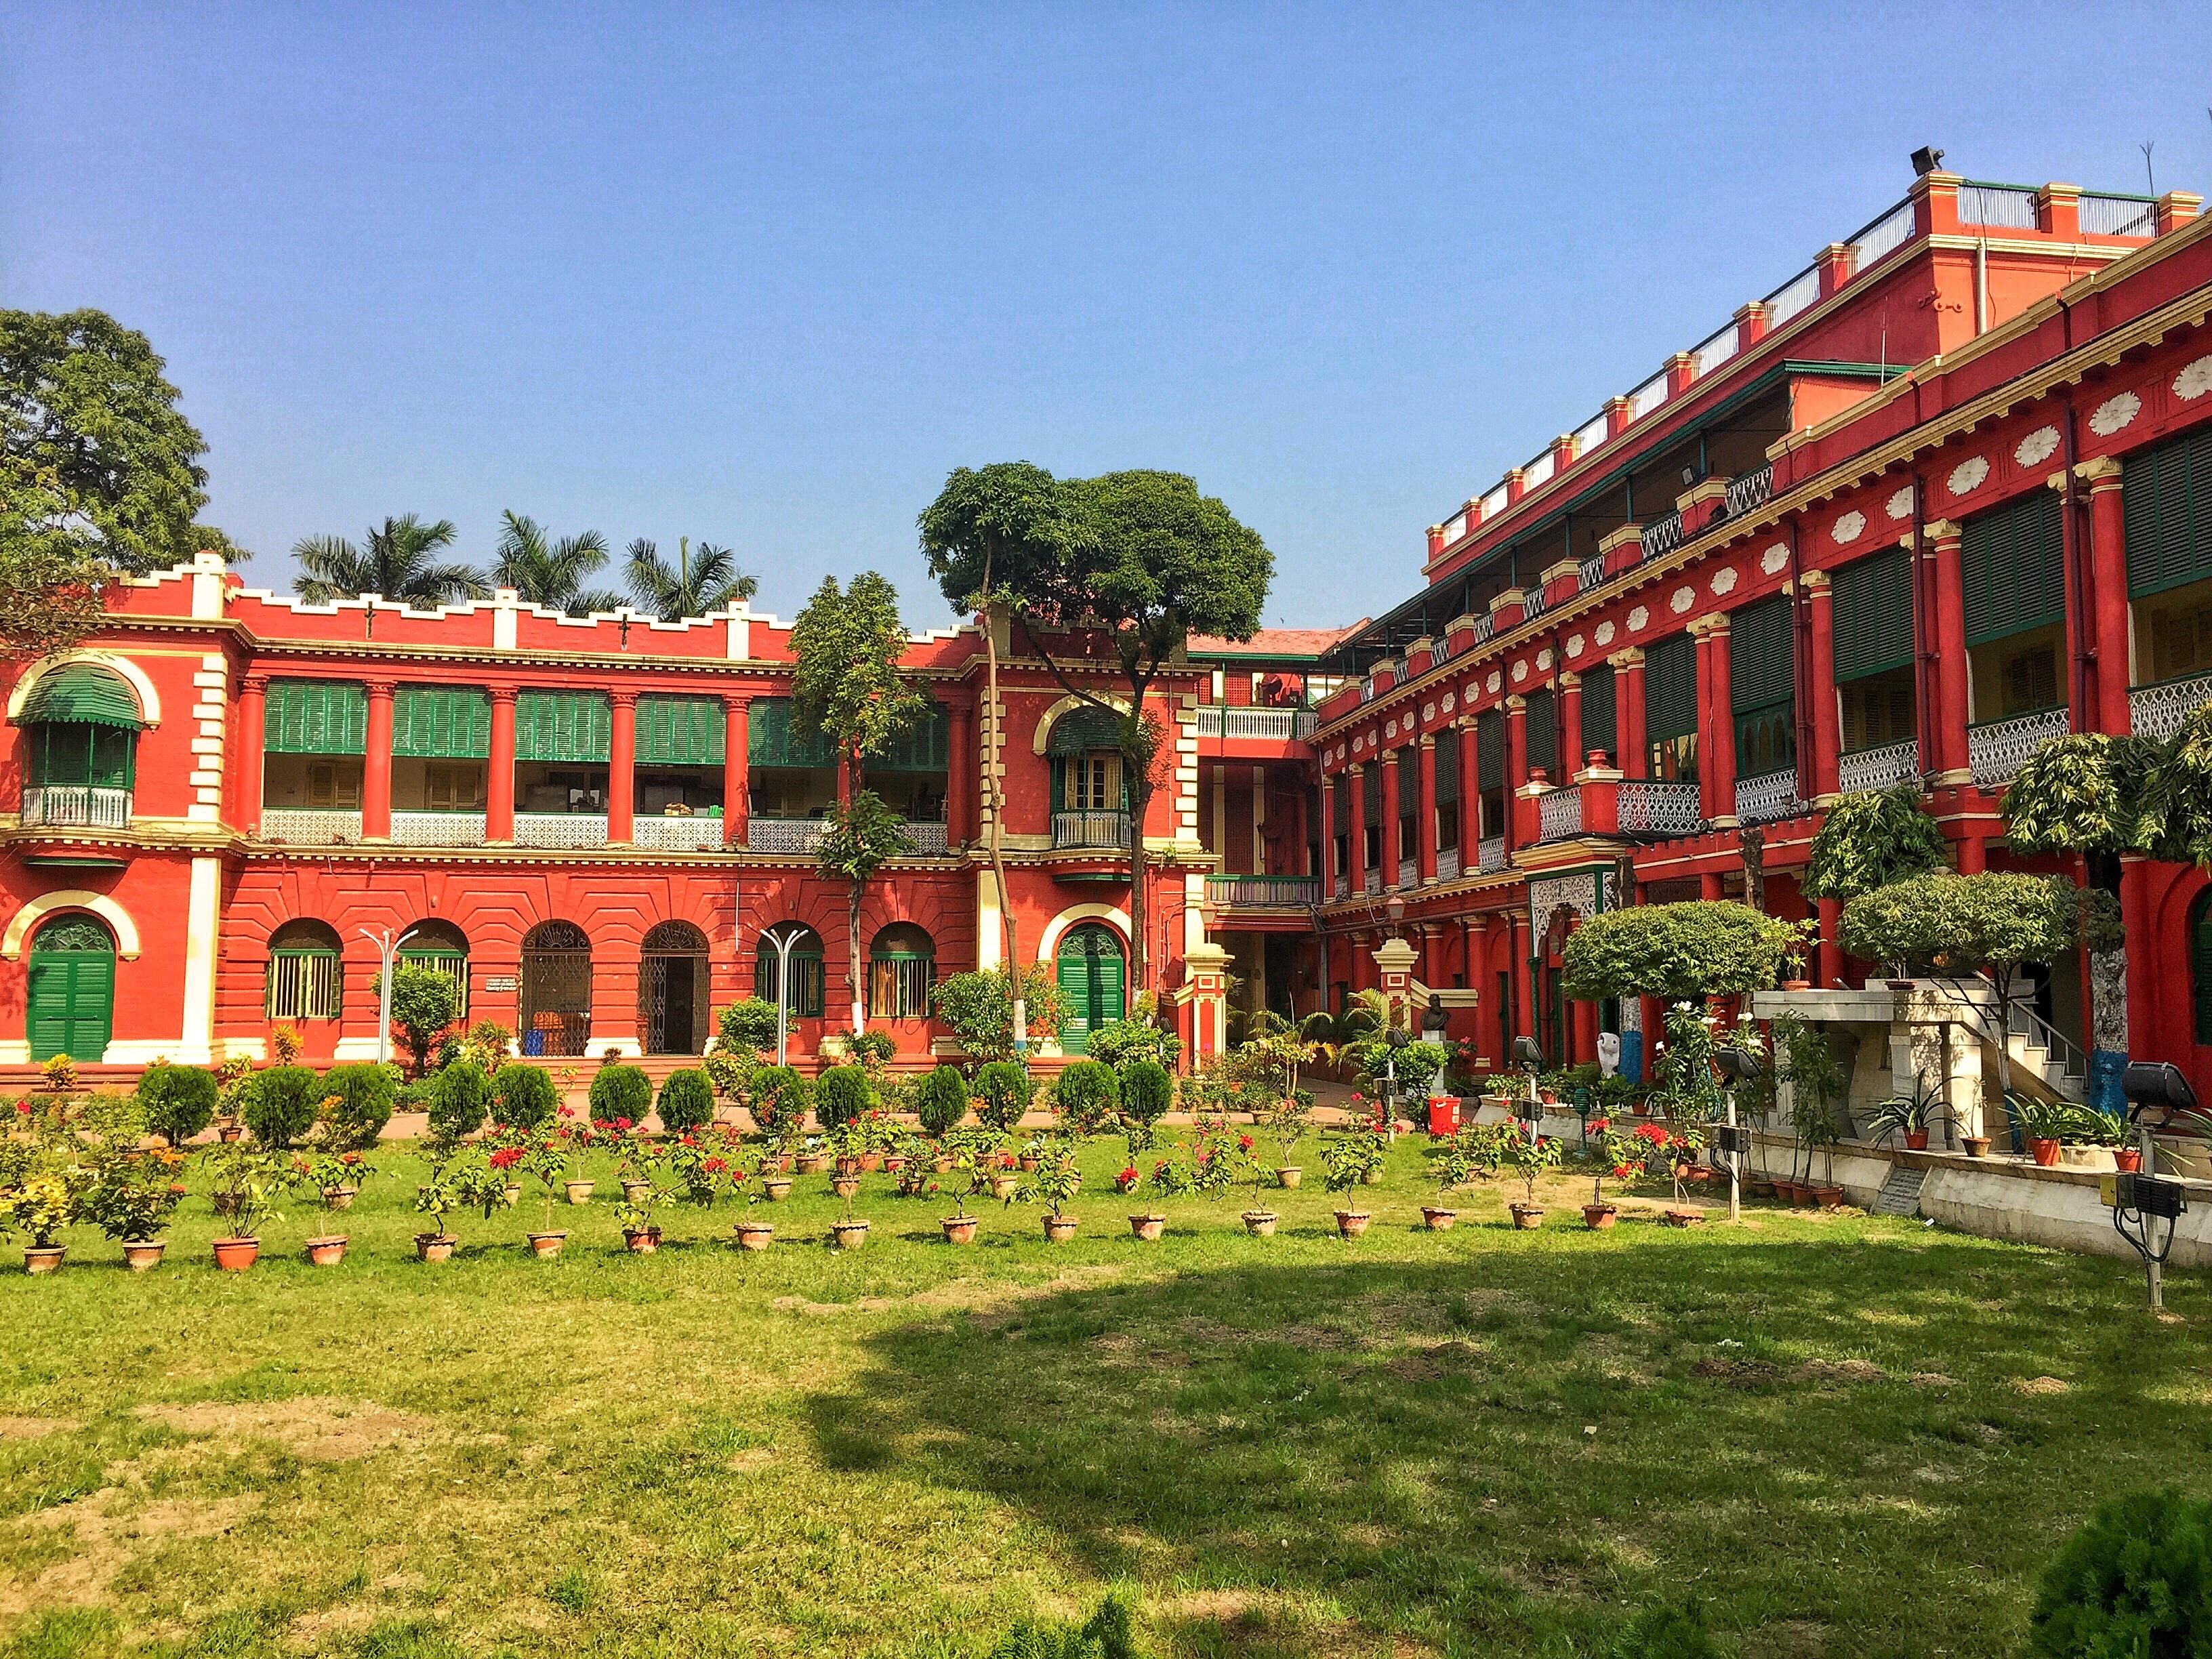 The ___________ is the ancestral home to Gurudev Rabindranath Tagore. - Jorasanko Thakur Bari